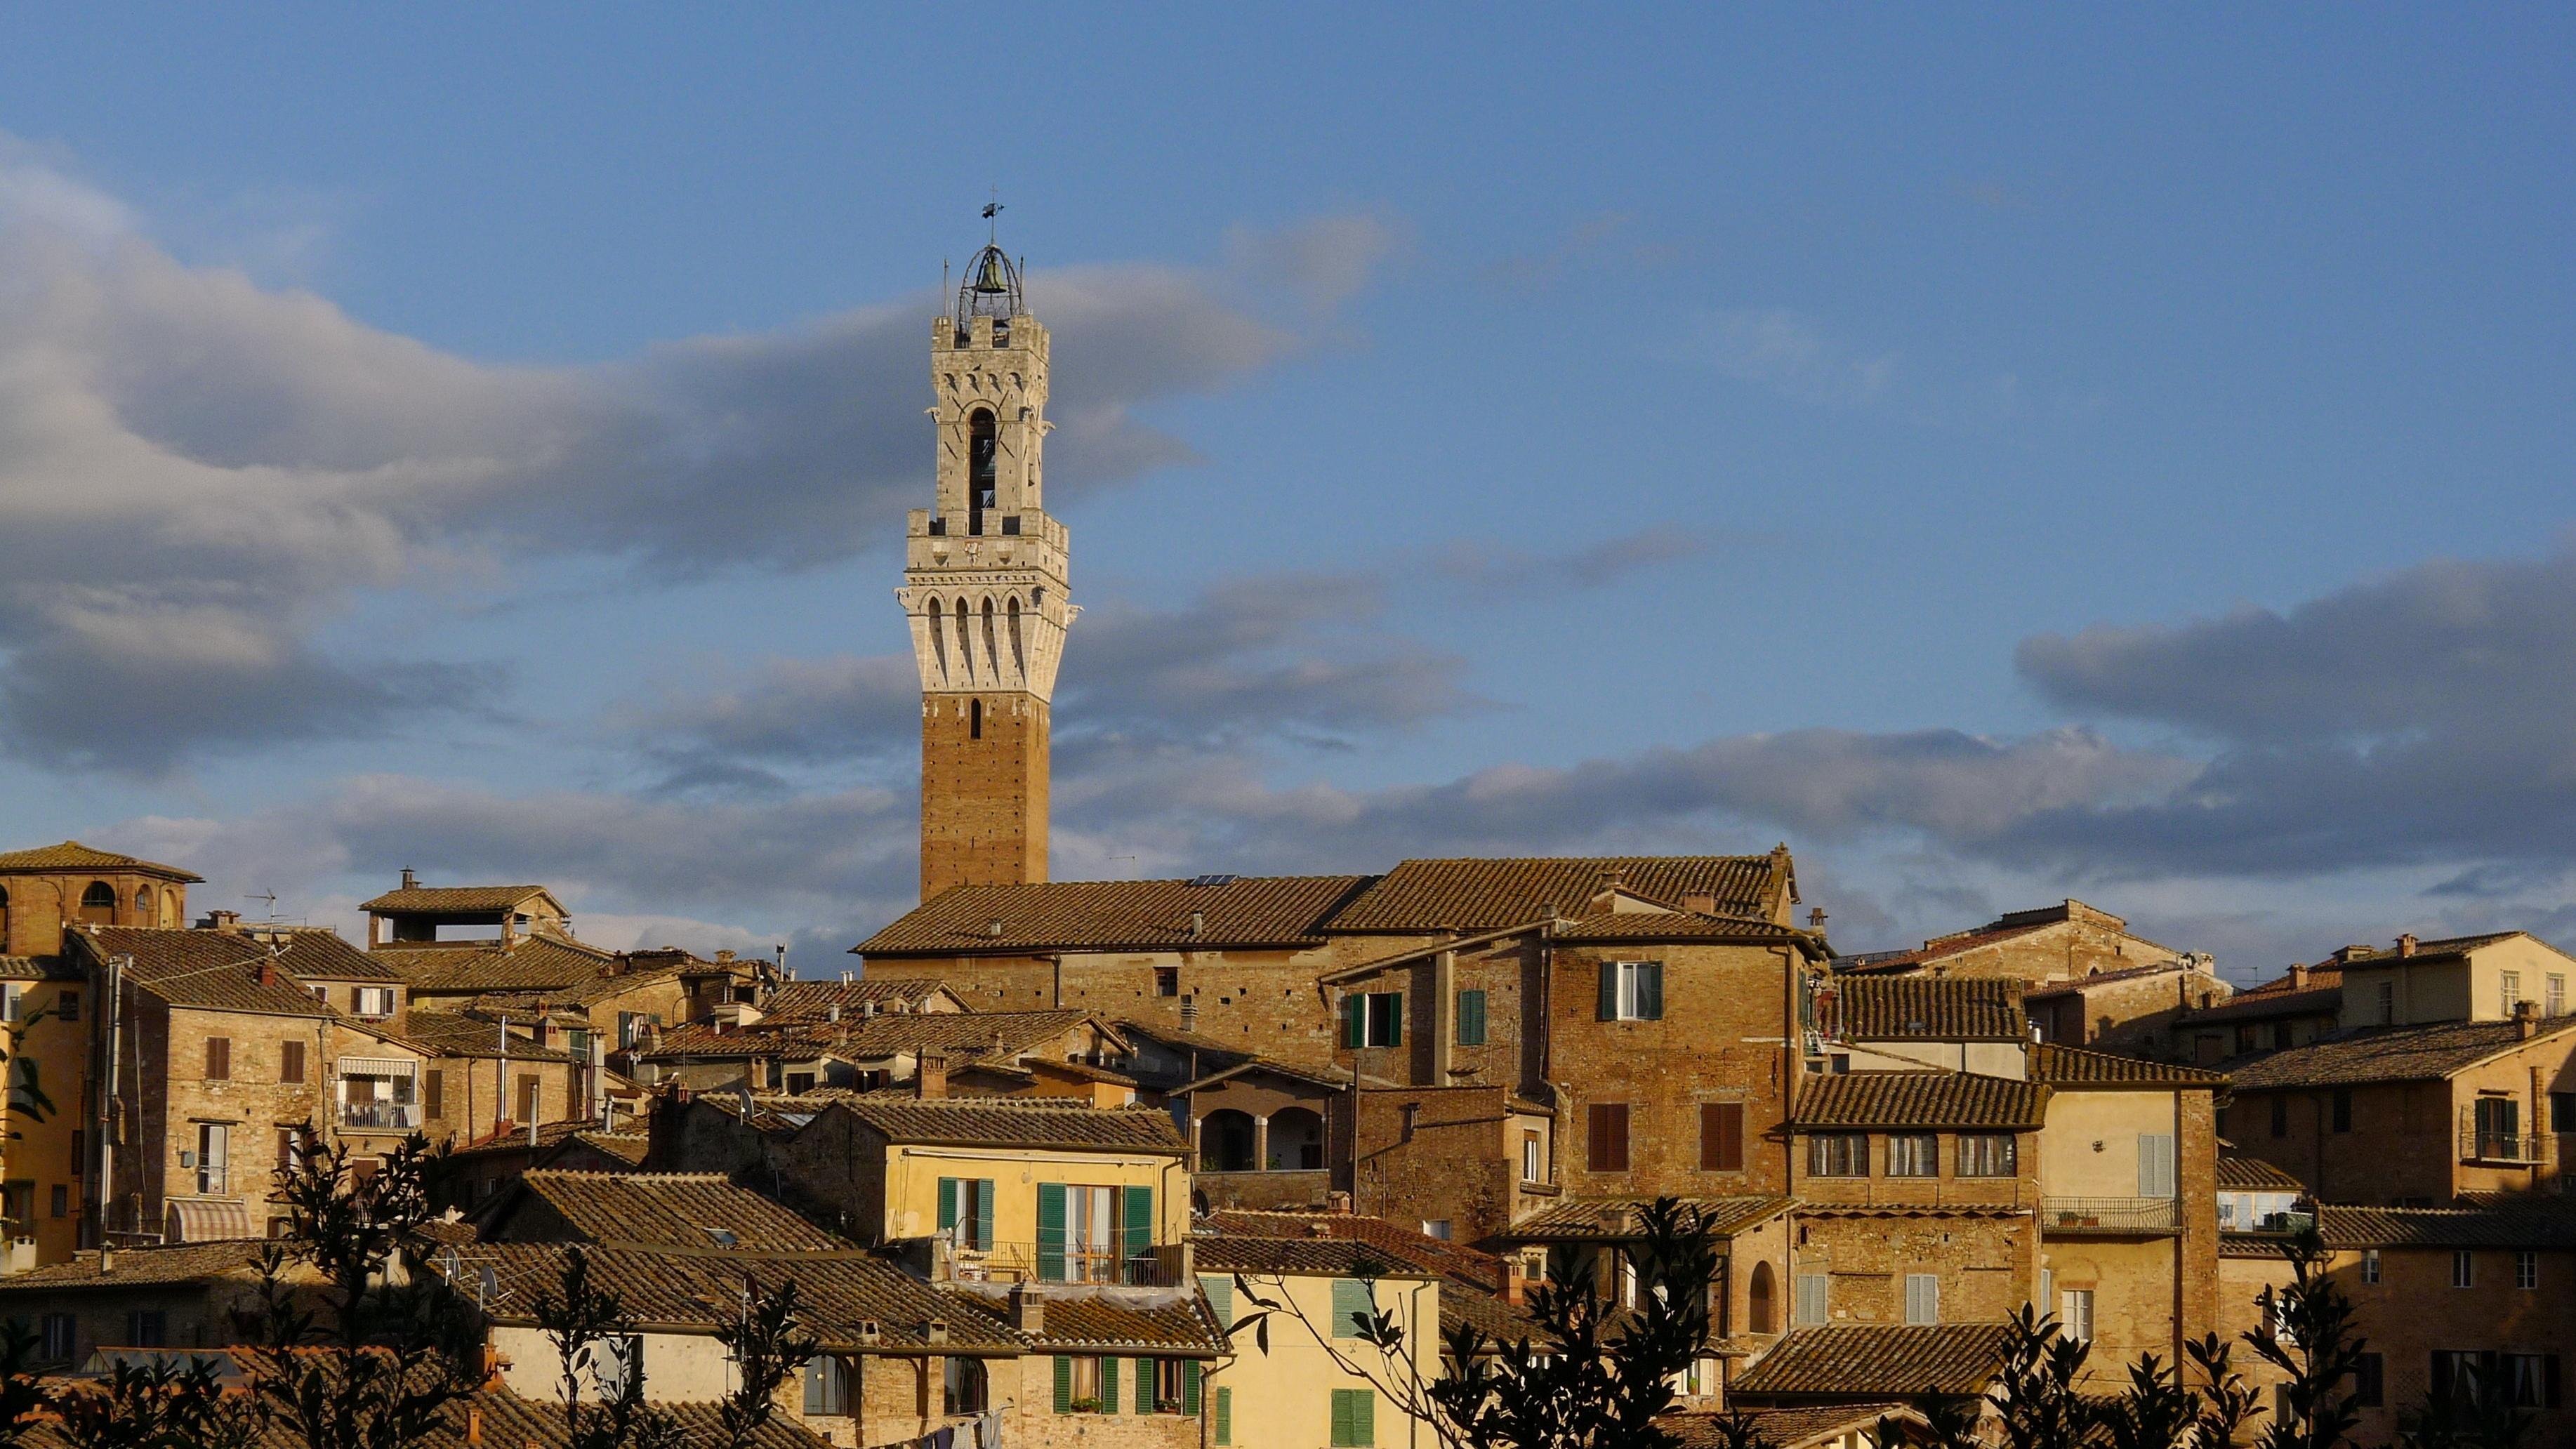 Siena Palazzo-Pubblico-Campanile-JBU02.jpg